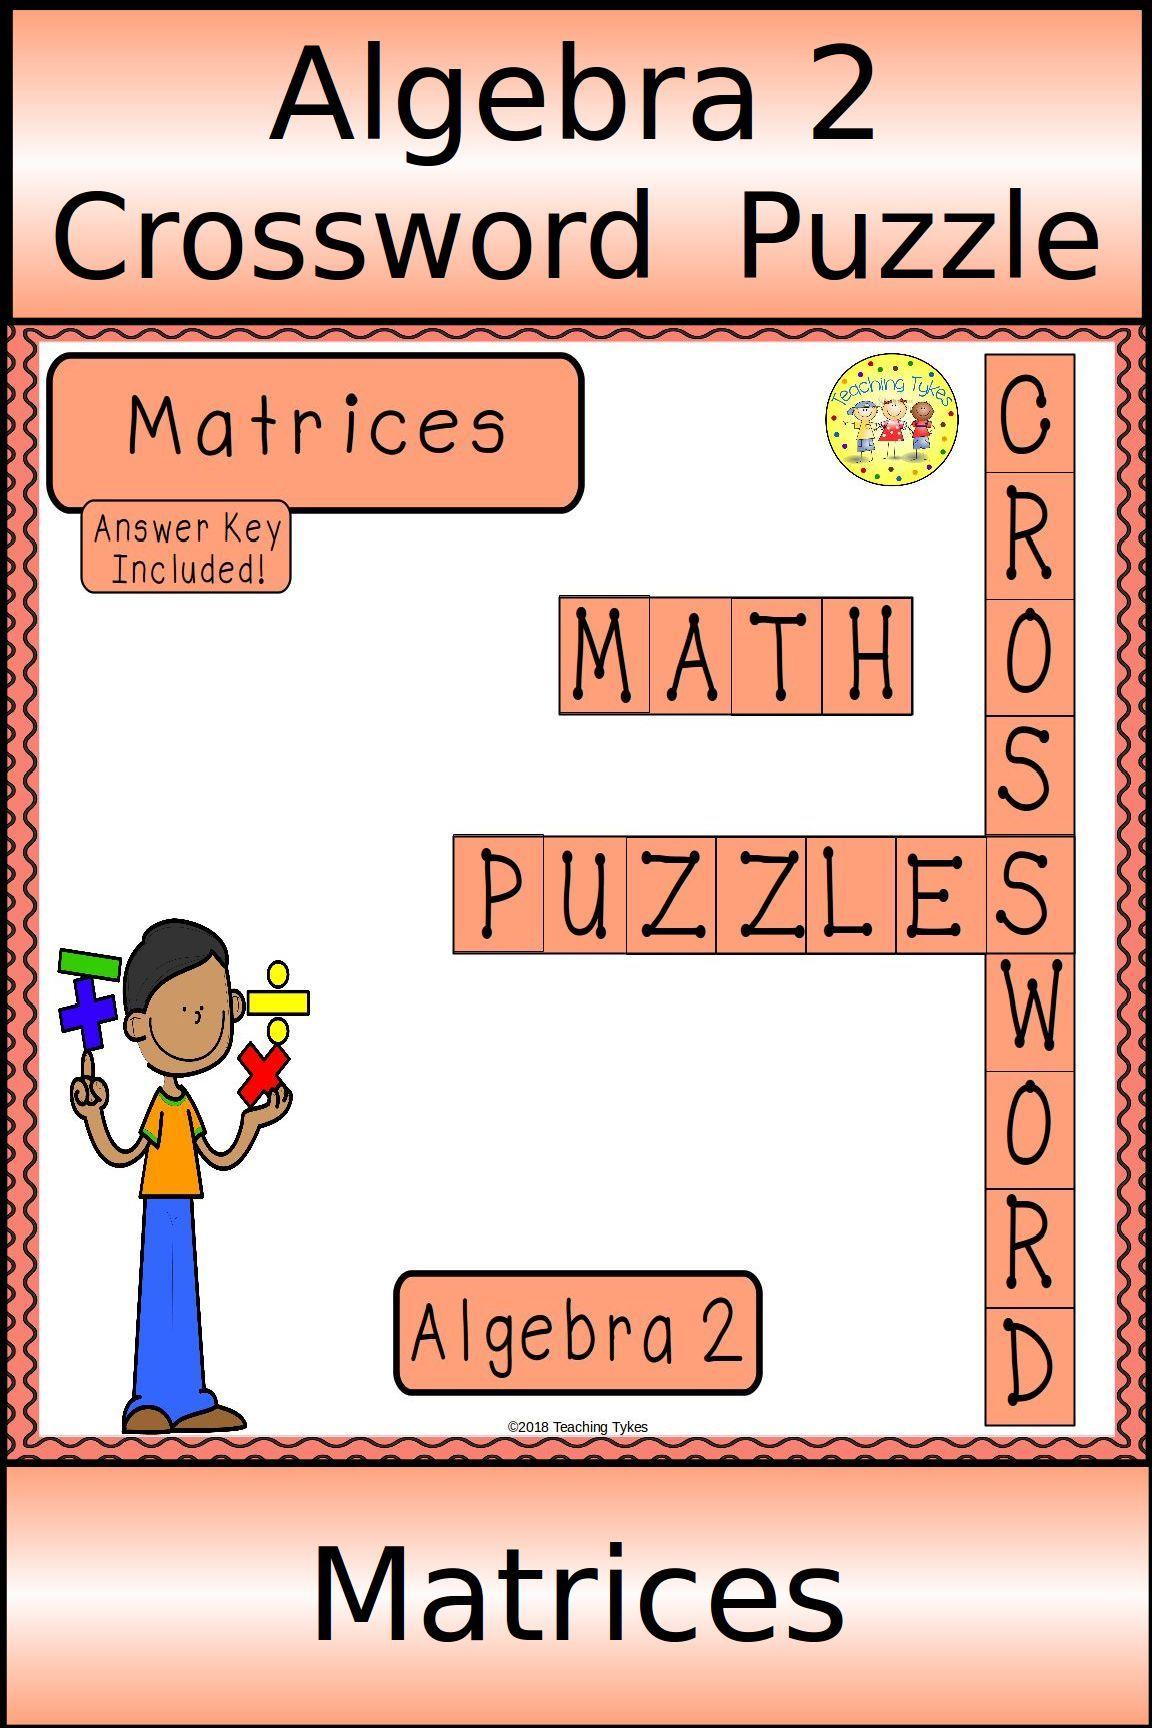 Algebra 2 Matrices Crossword Puzzle Vocabulary Activities Mathematics Worksheets Radical Equations